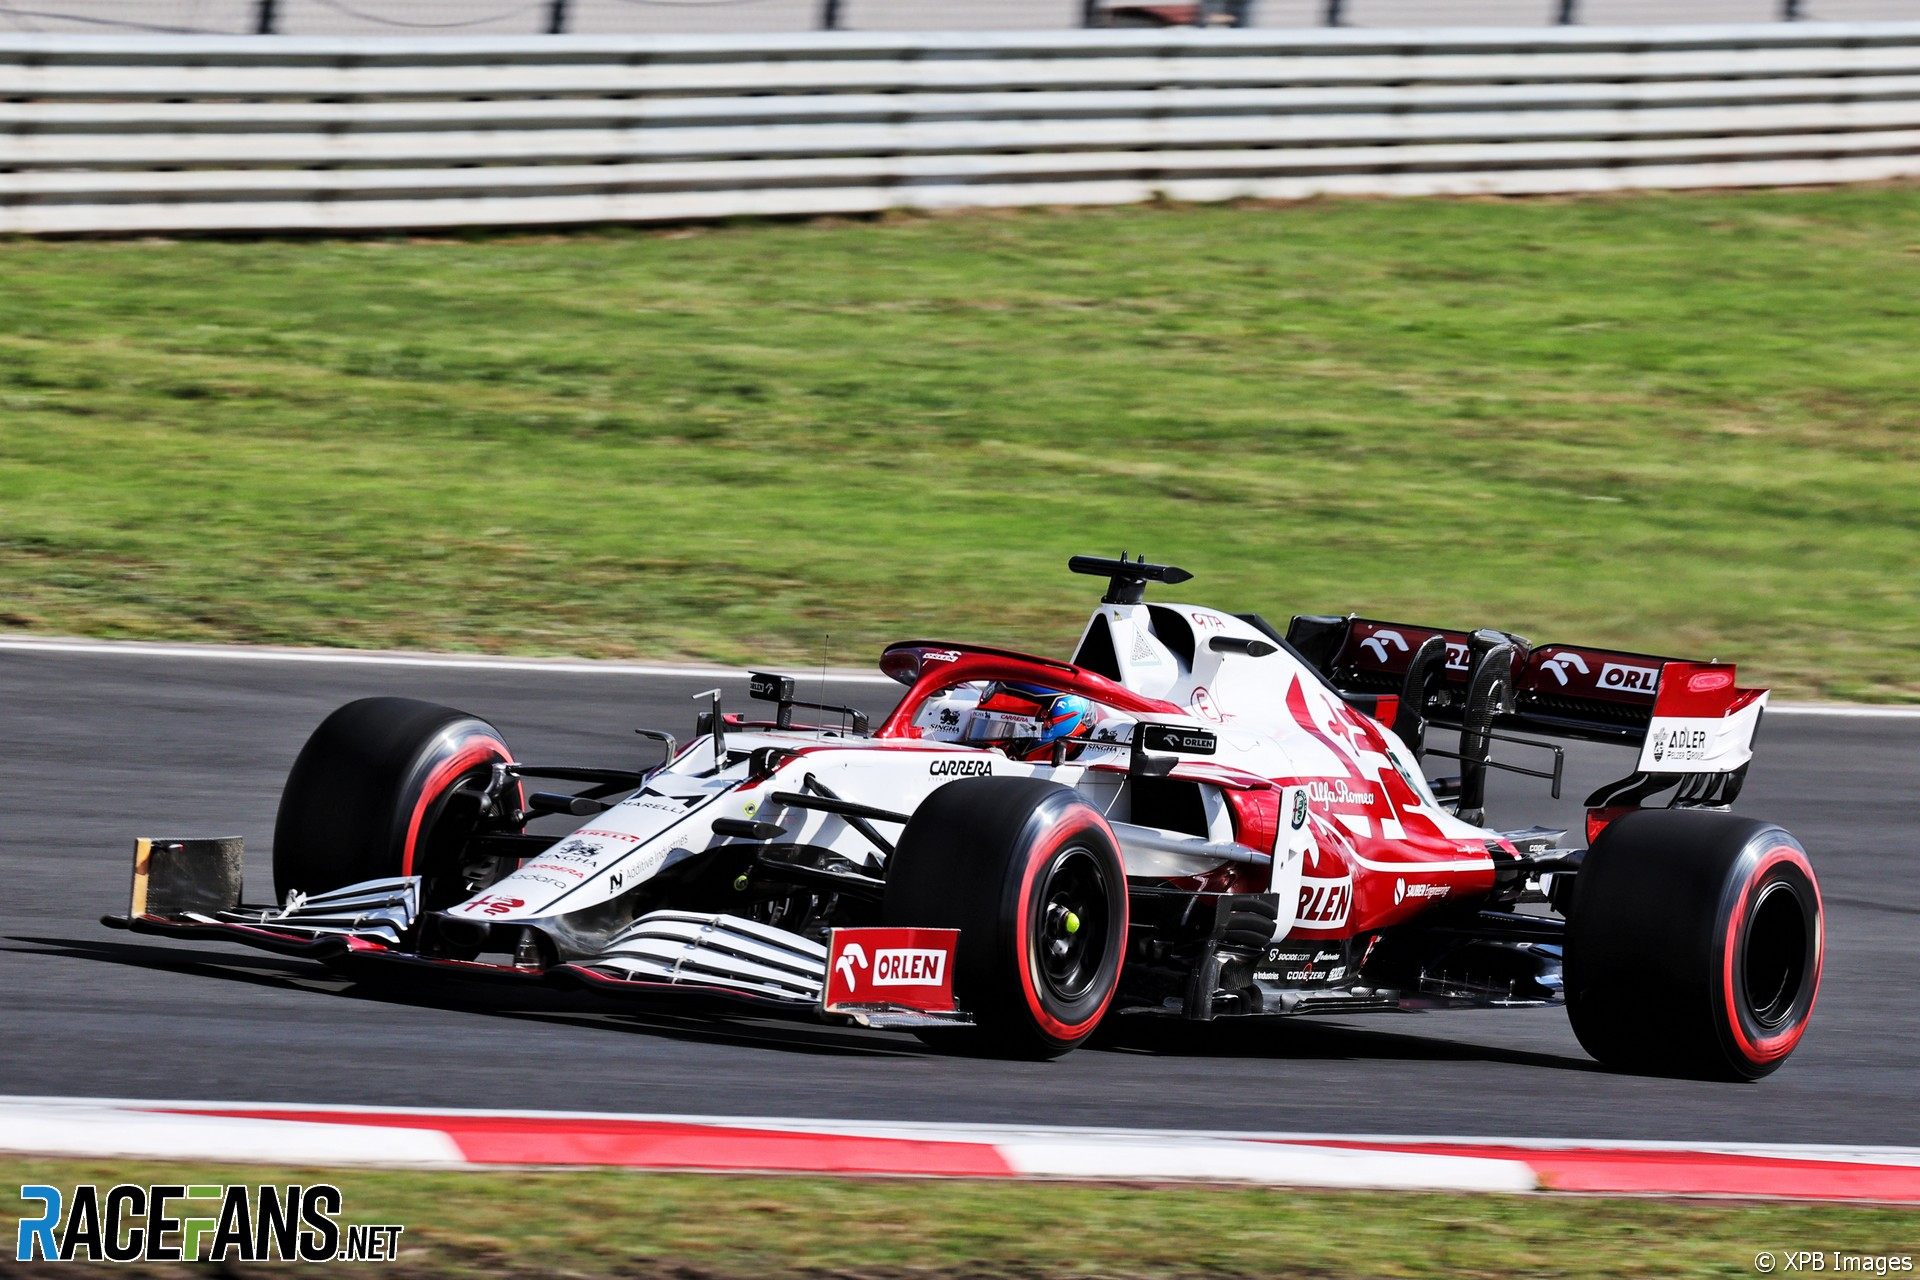 Kimi Raikkonen, Alfa Romeo, Istanbul Park, 2021